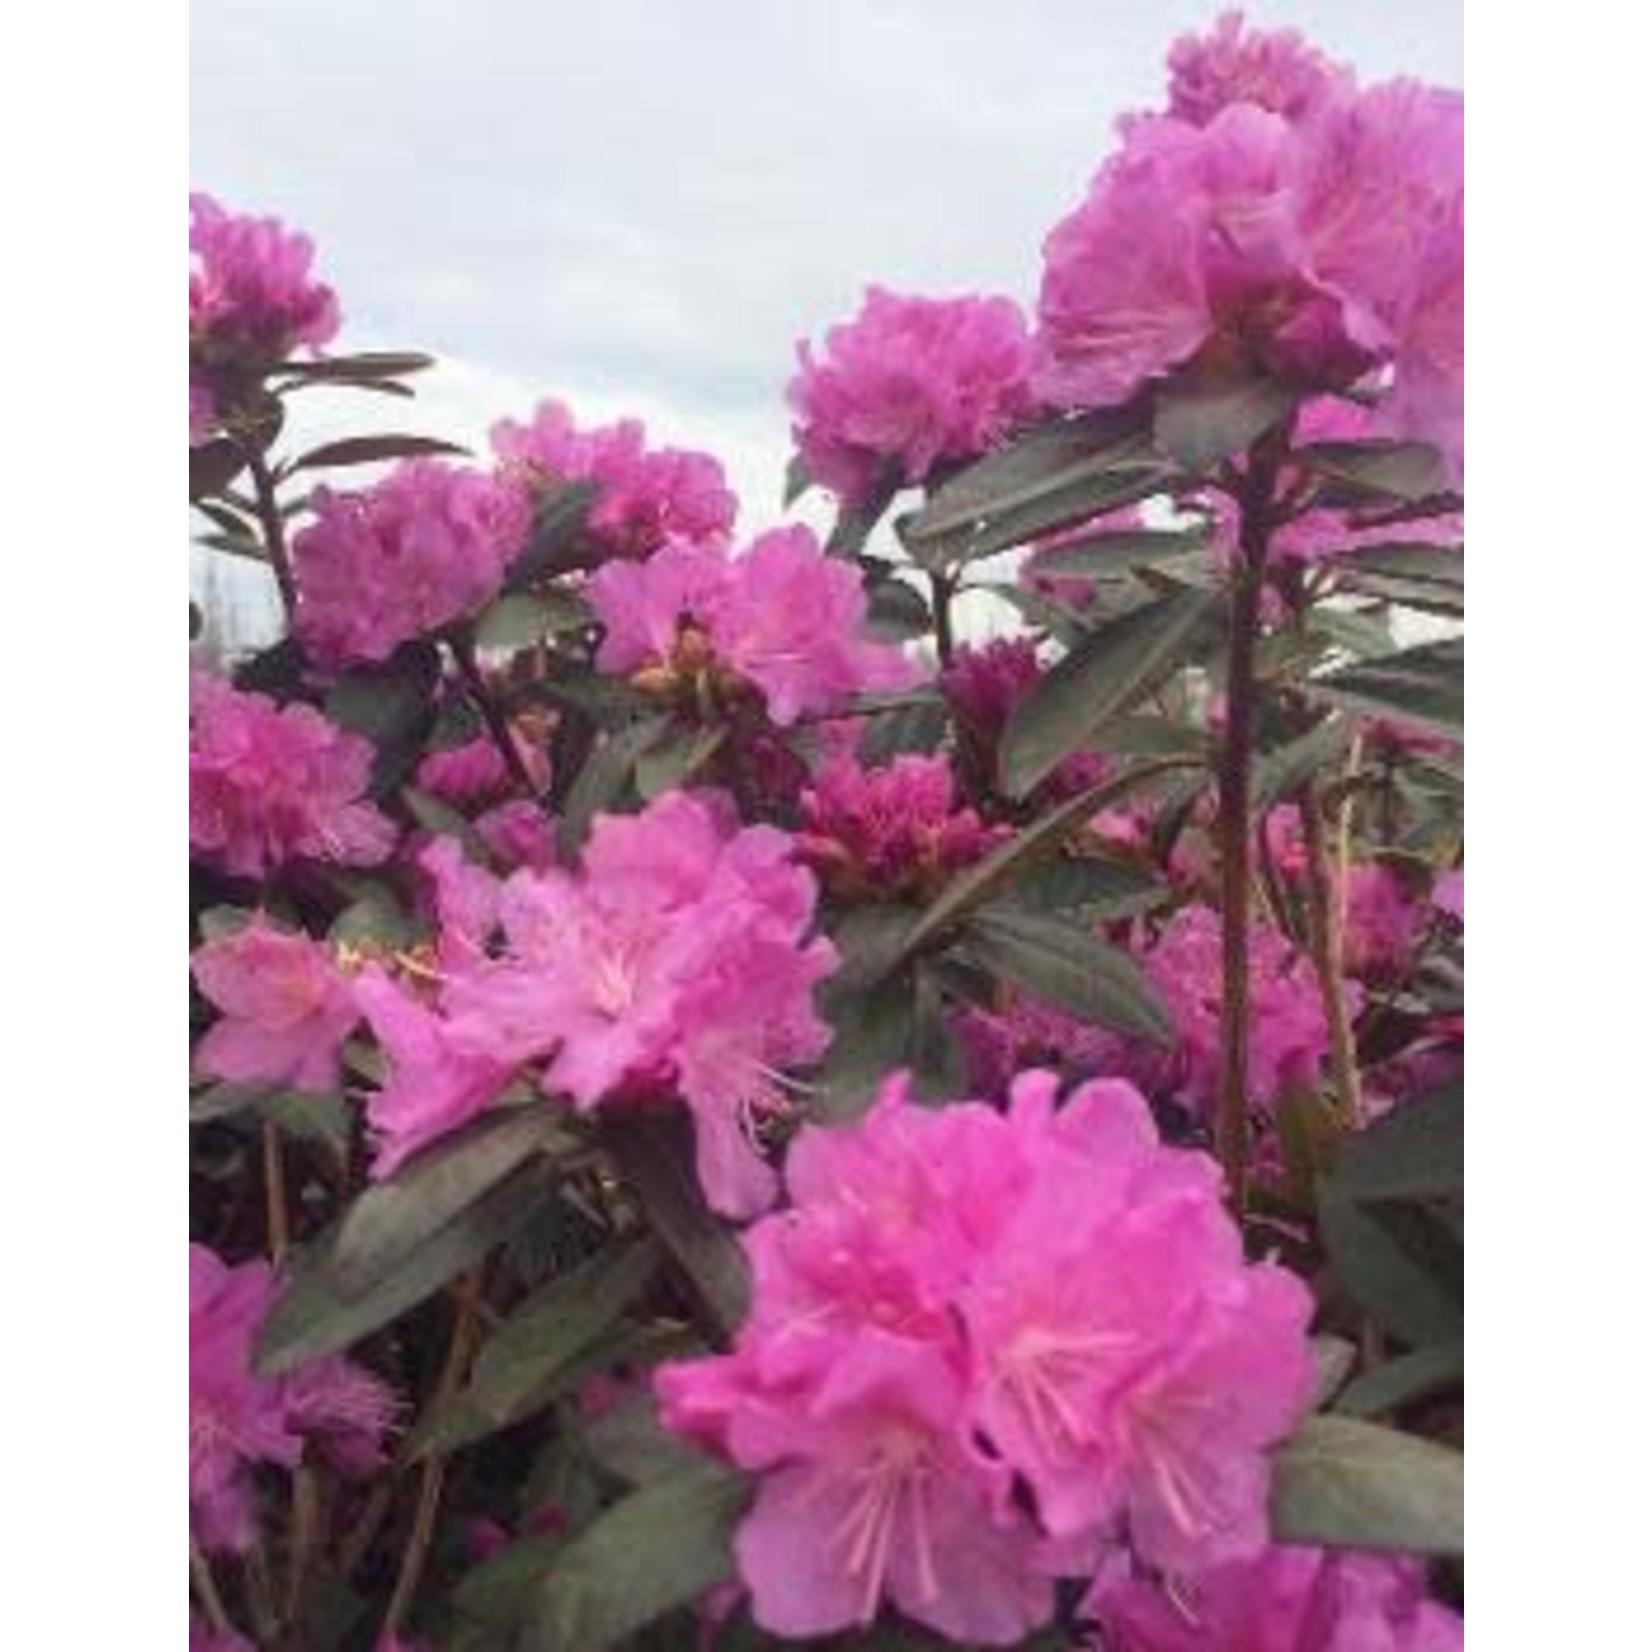 Rhododendron 'P.J.M. elite star' - 3 gal